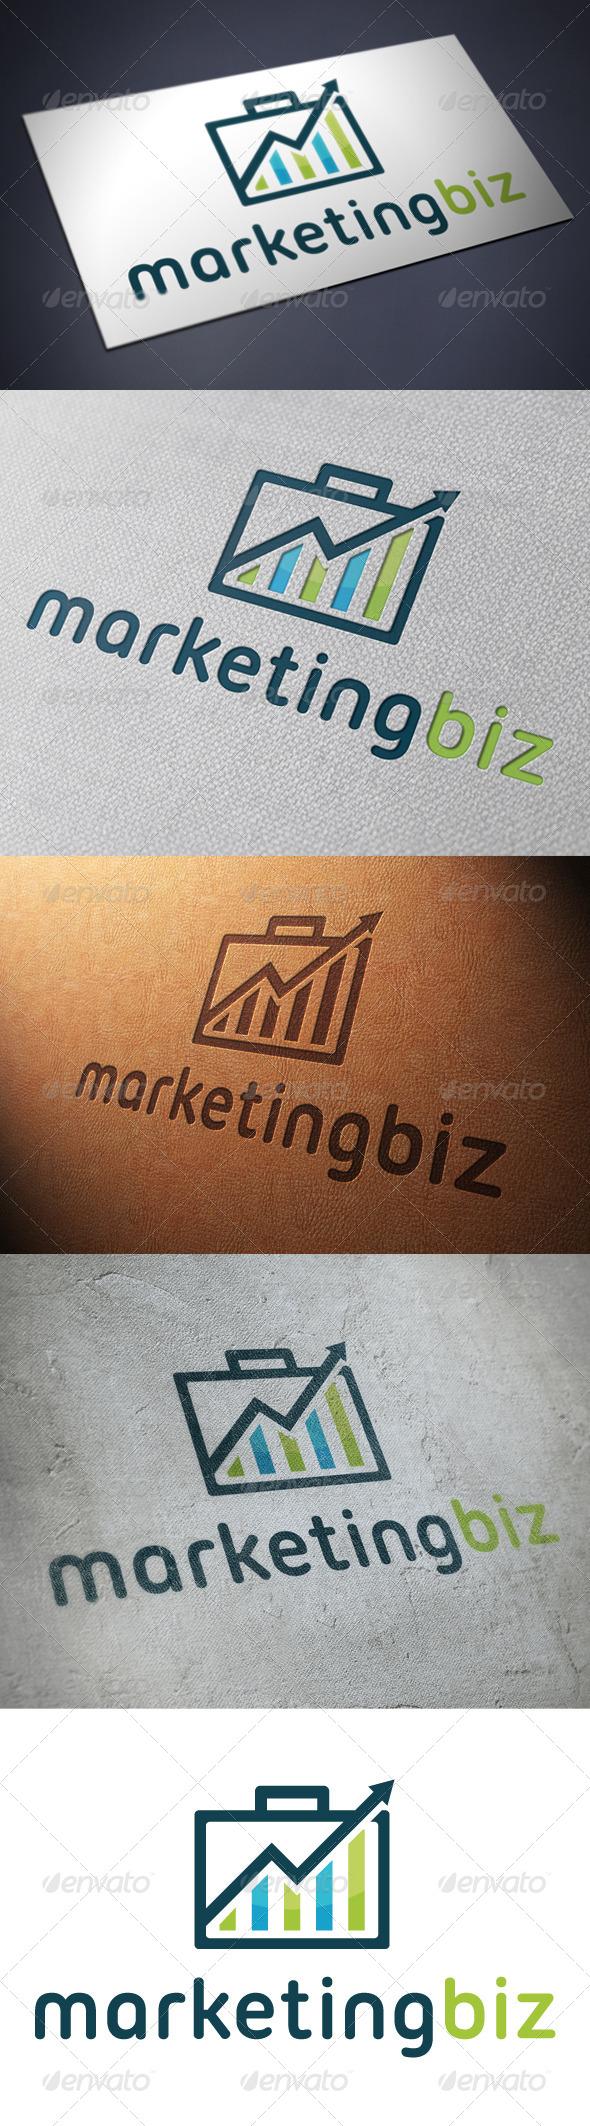 GraphicRiver Marketing Business Logo Template 4898689